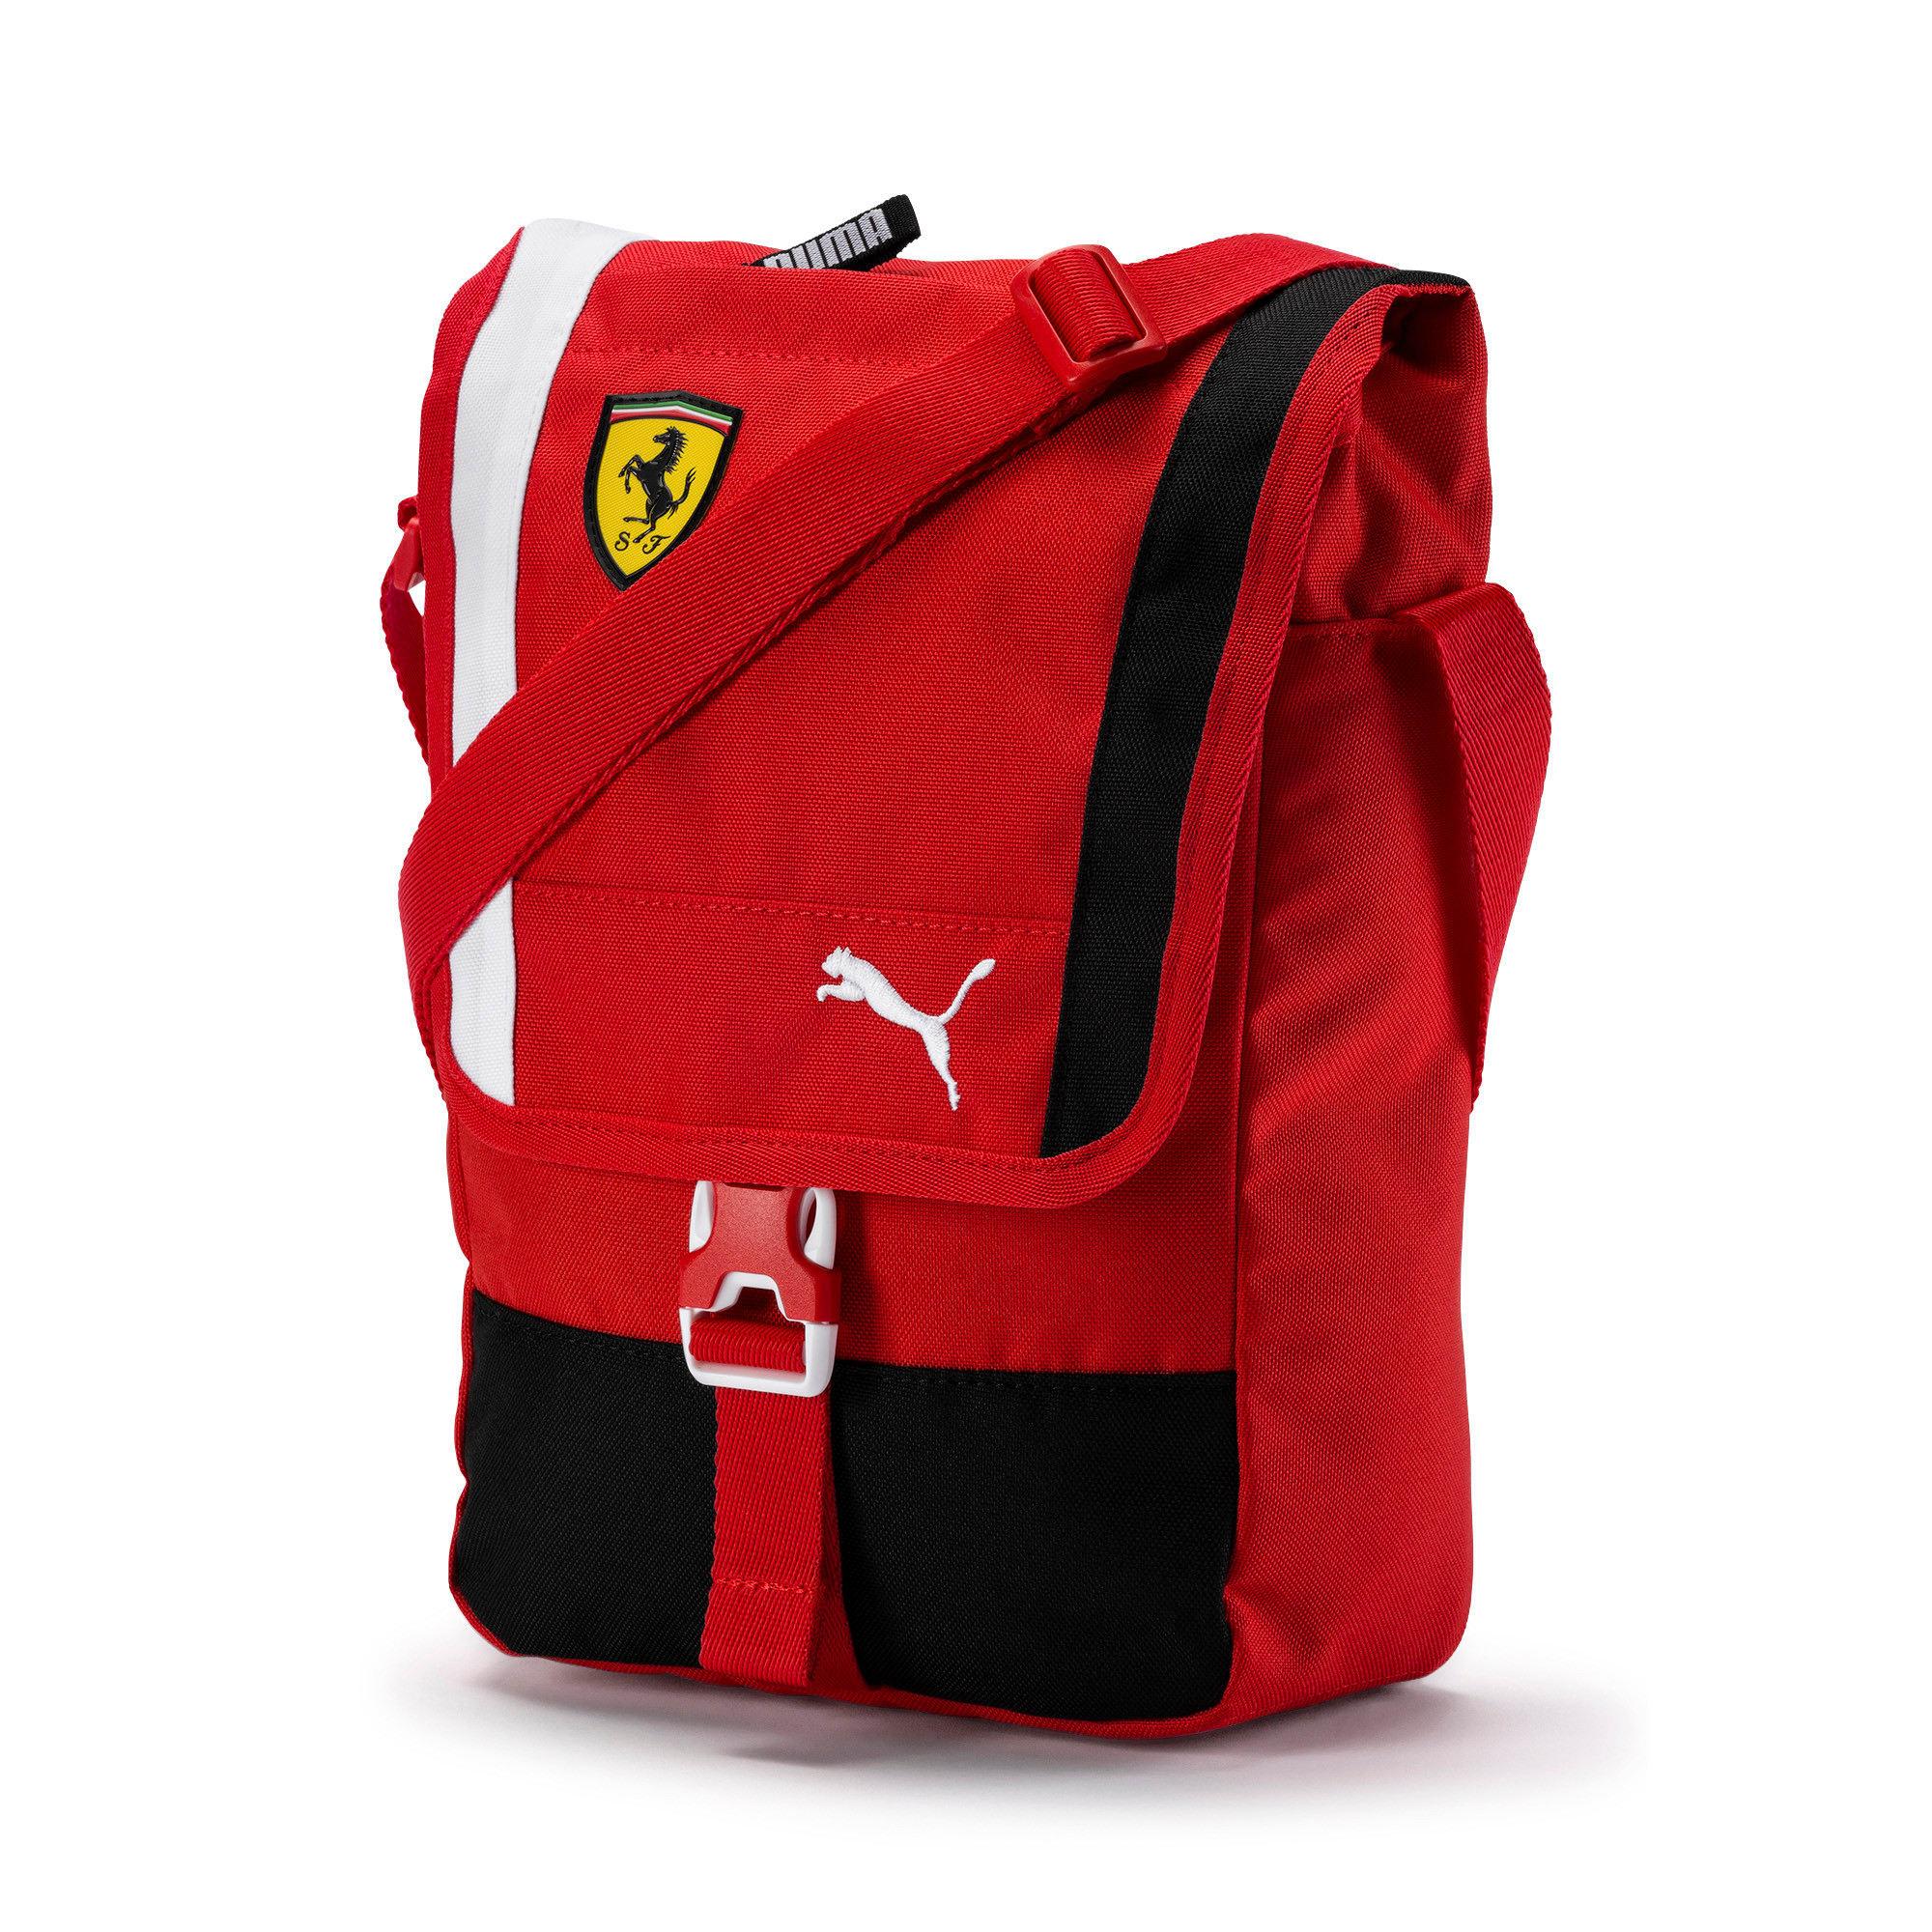 Thumbnail 1 of Scuderia Ferrari Fanwear Portable, Rosso Corsa, medium